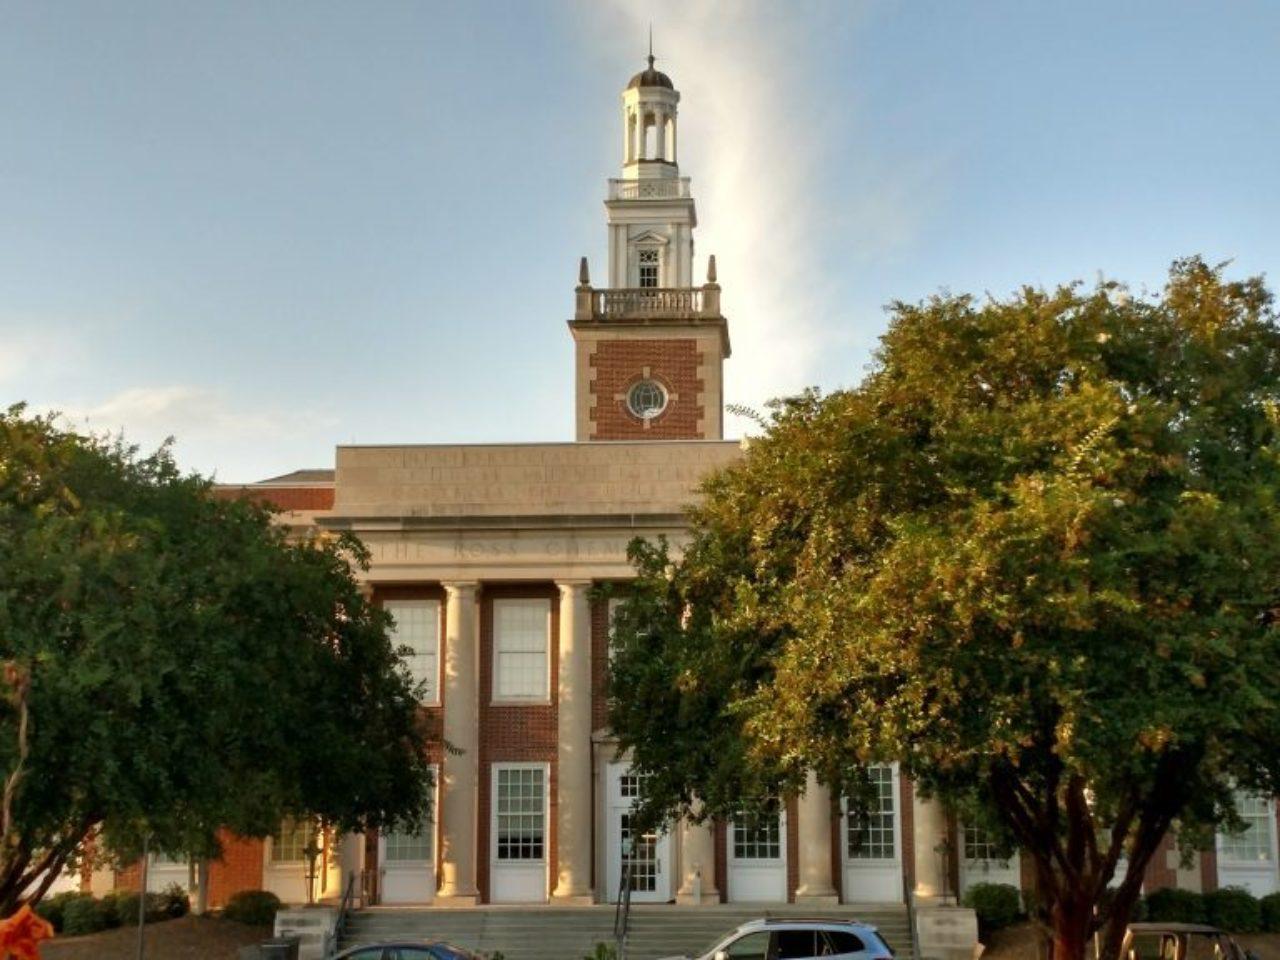 Ross Hall at Auburn University